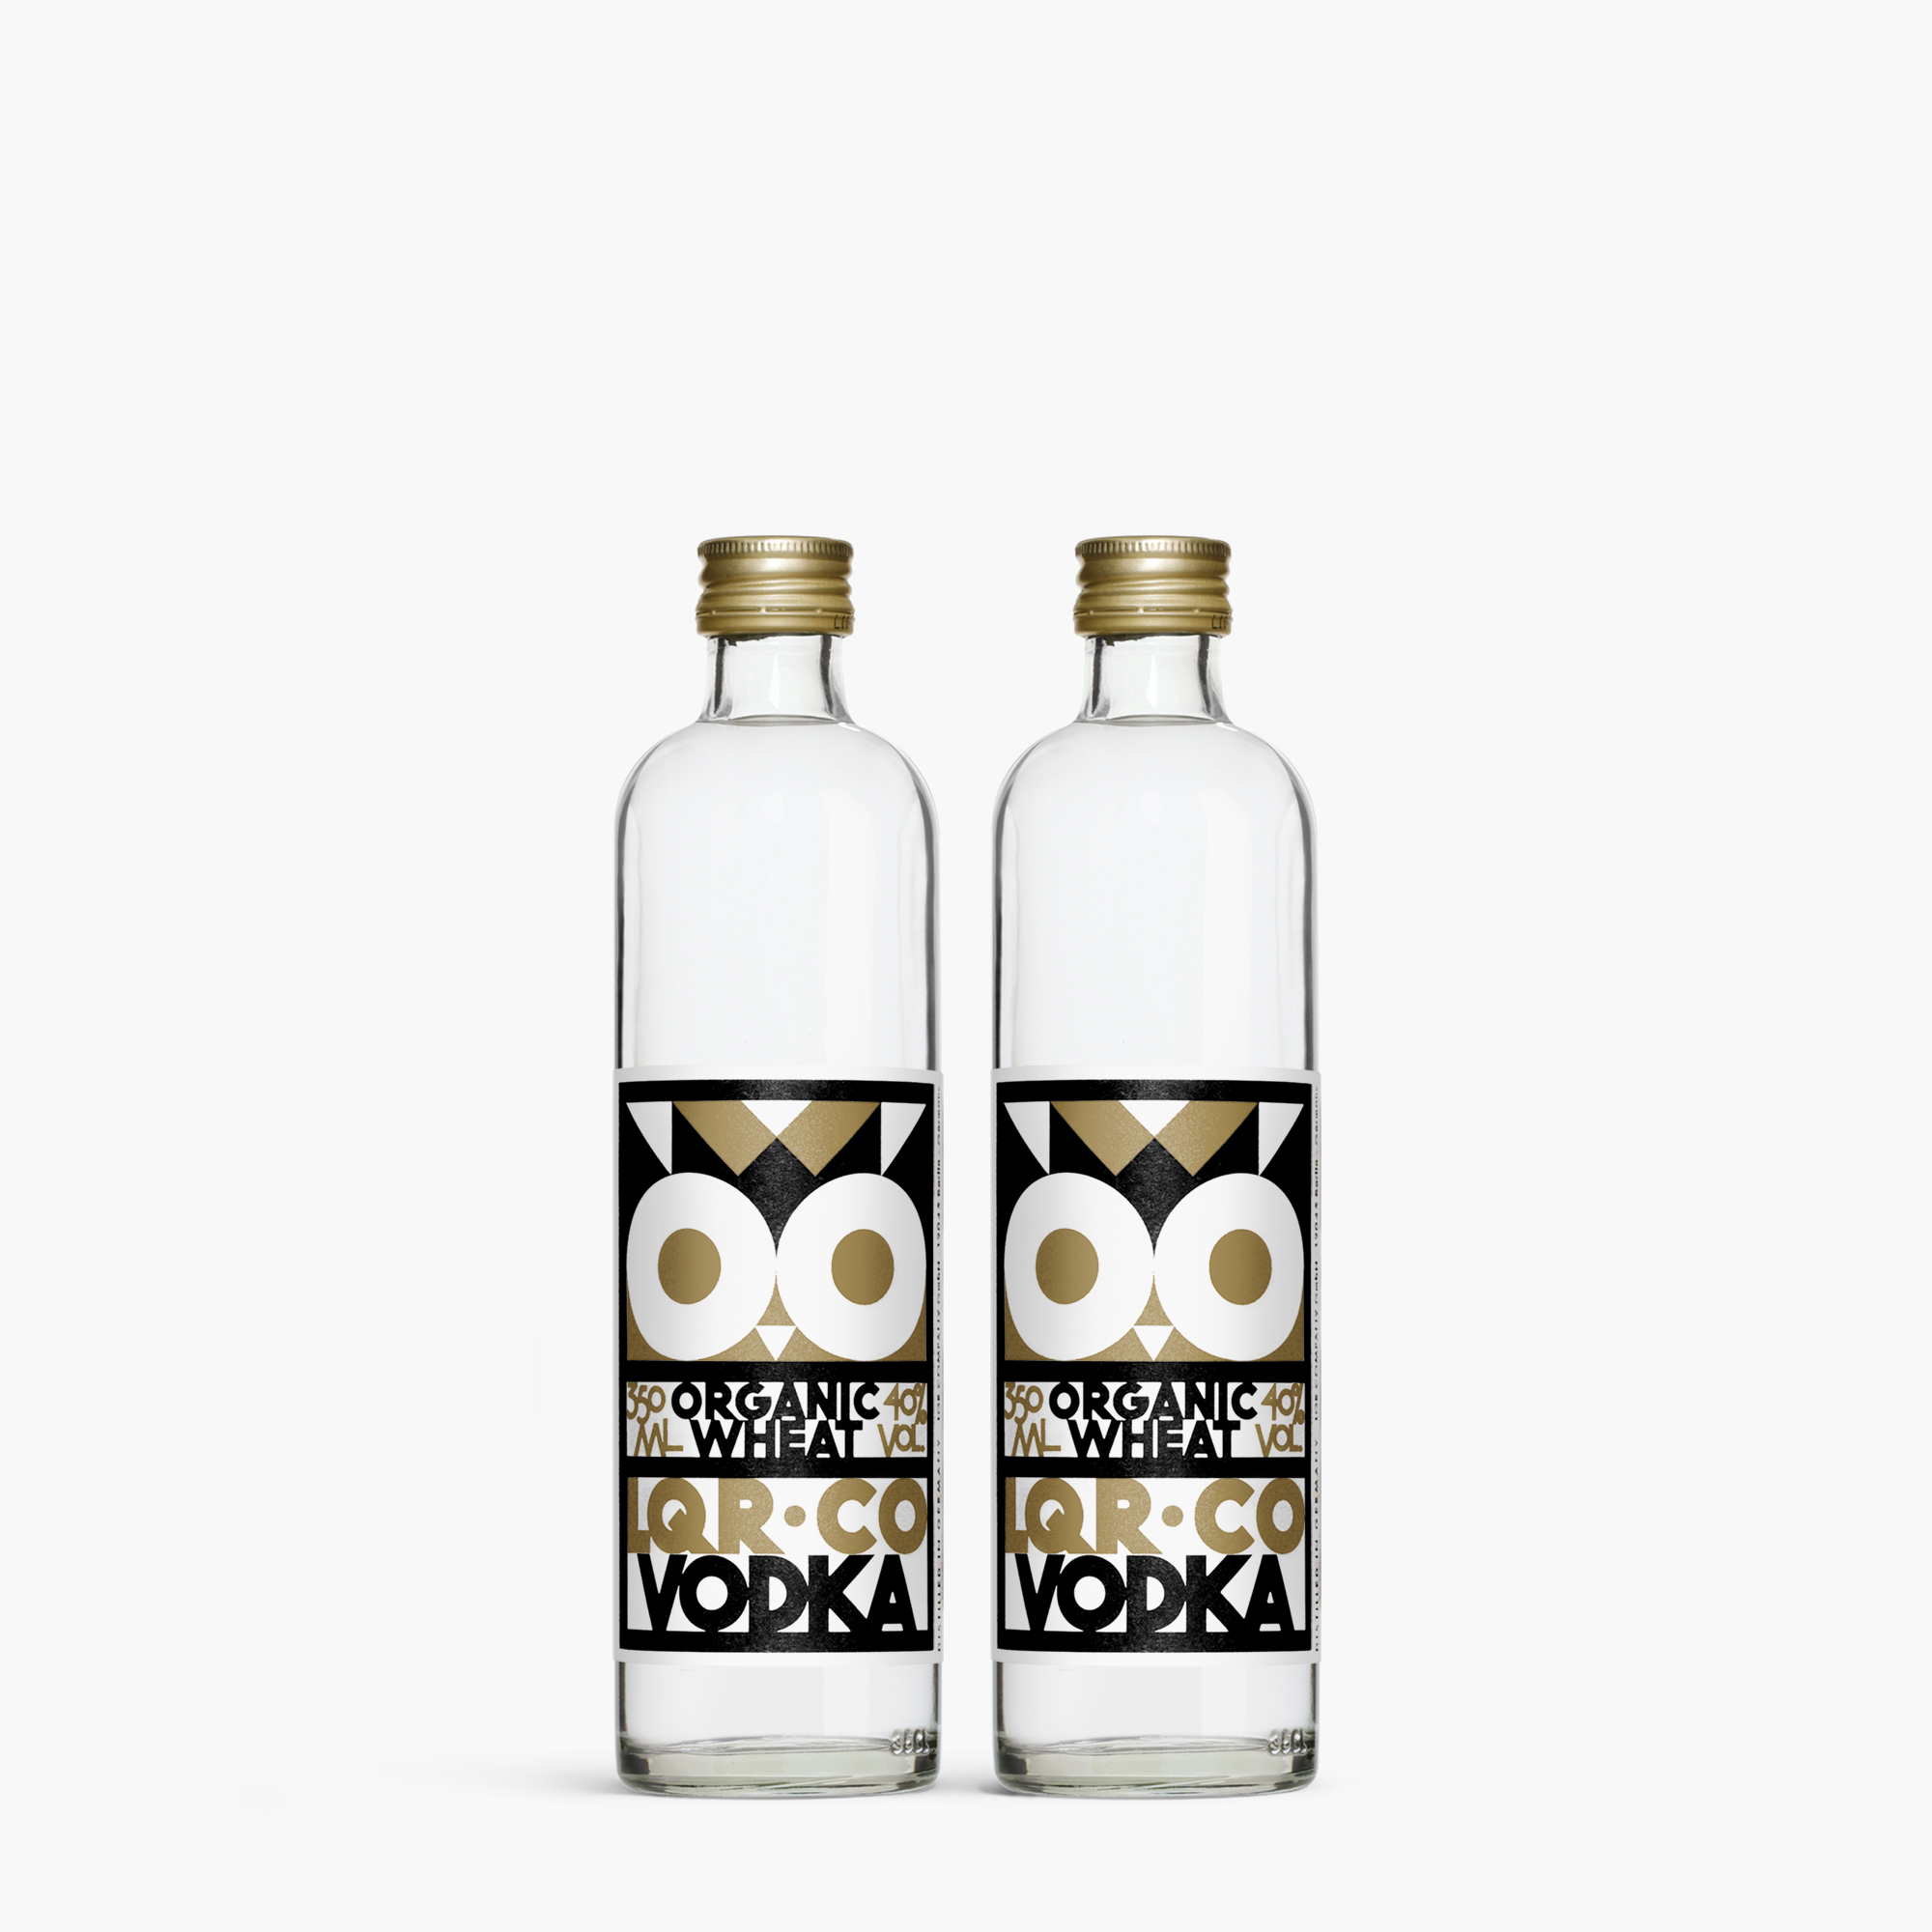 LQR Co. Organic Vodka